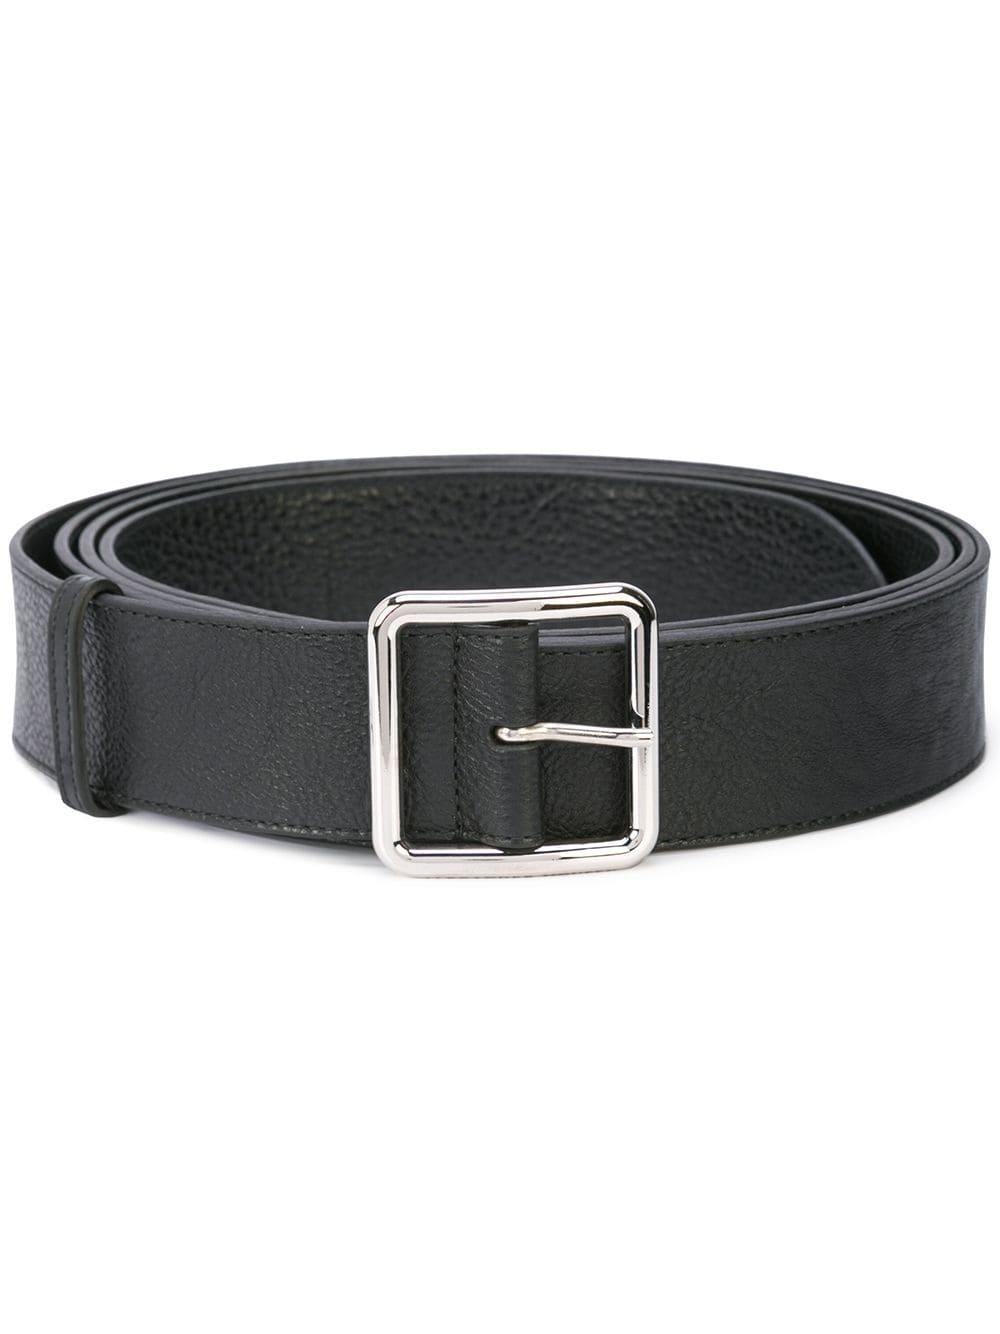 Long Leather Belt Item # 5326381AC0I